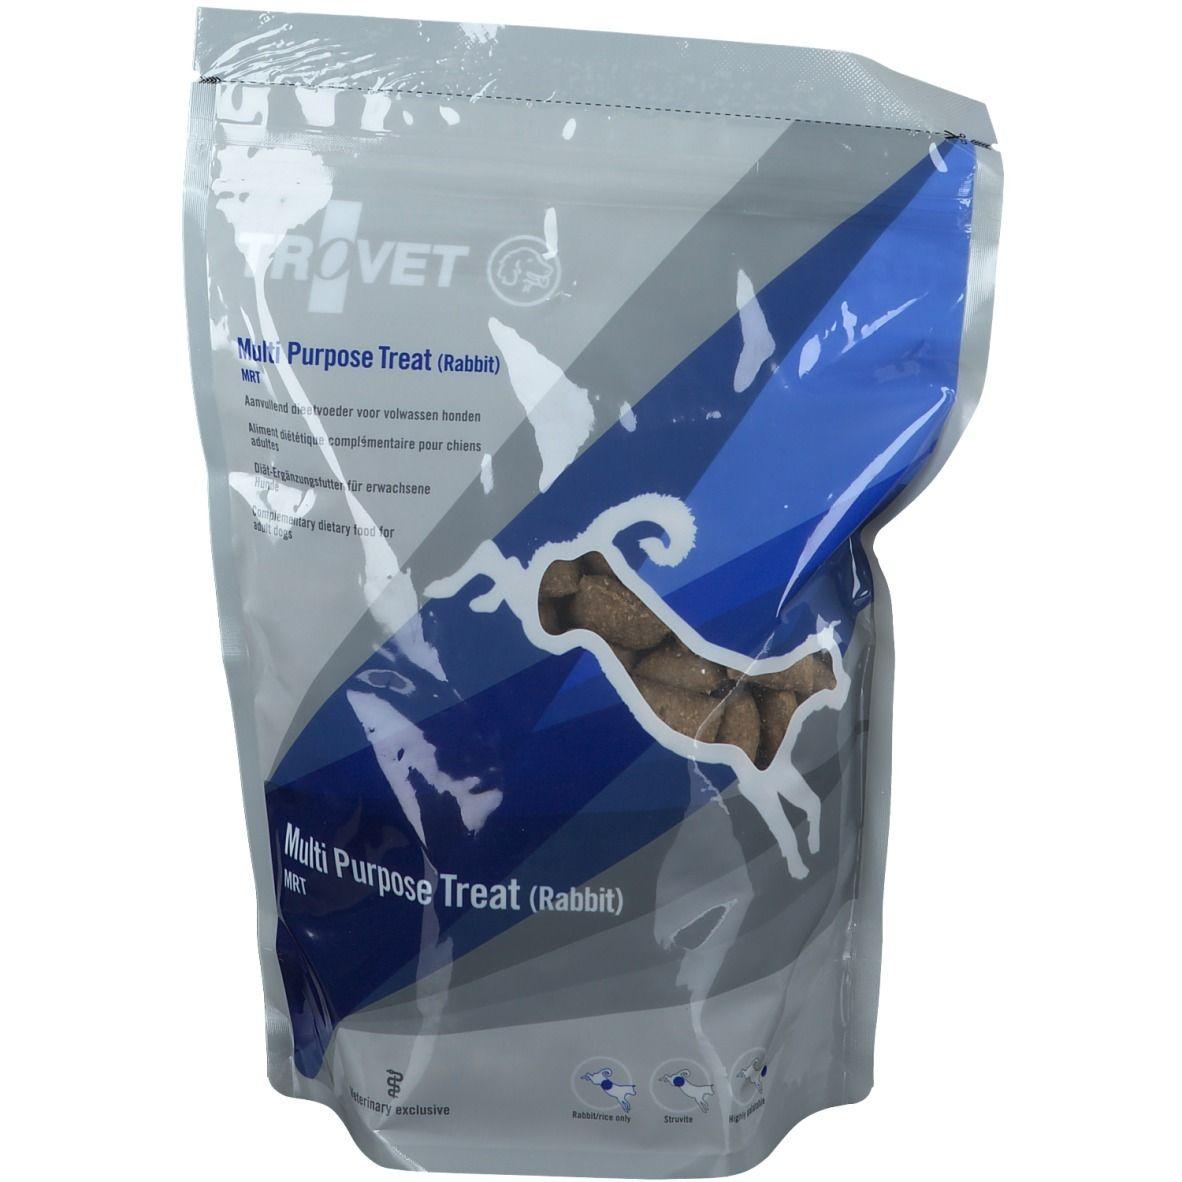 TROVET Multi Purpose Treat (Rabbit) MRT Cane